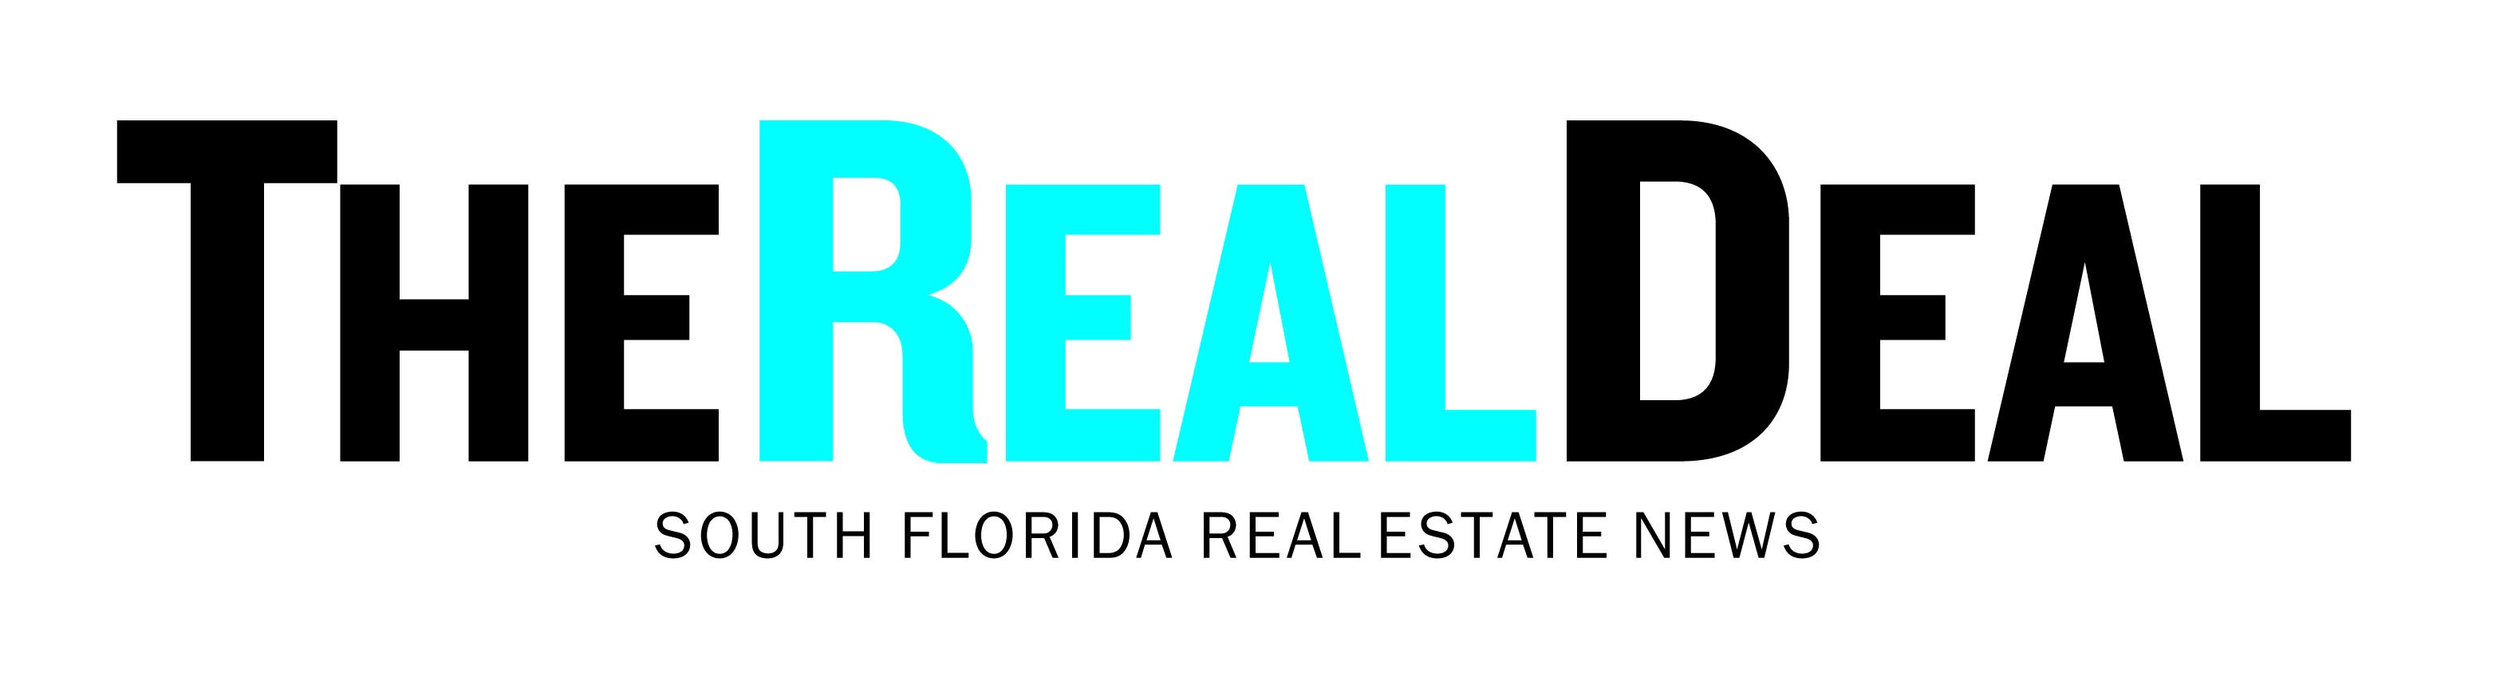 The-Real-Deal-South-Florida-logo.jpg